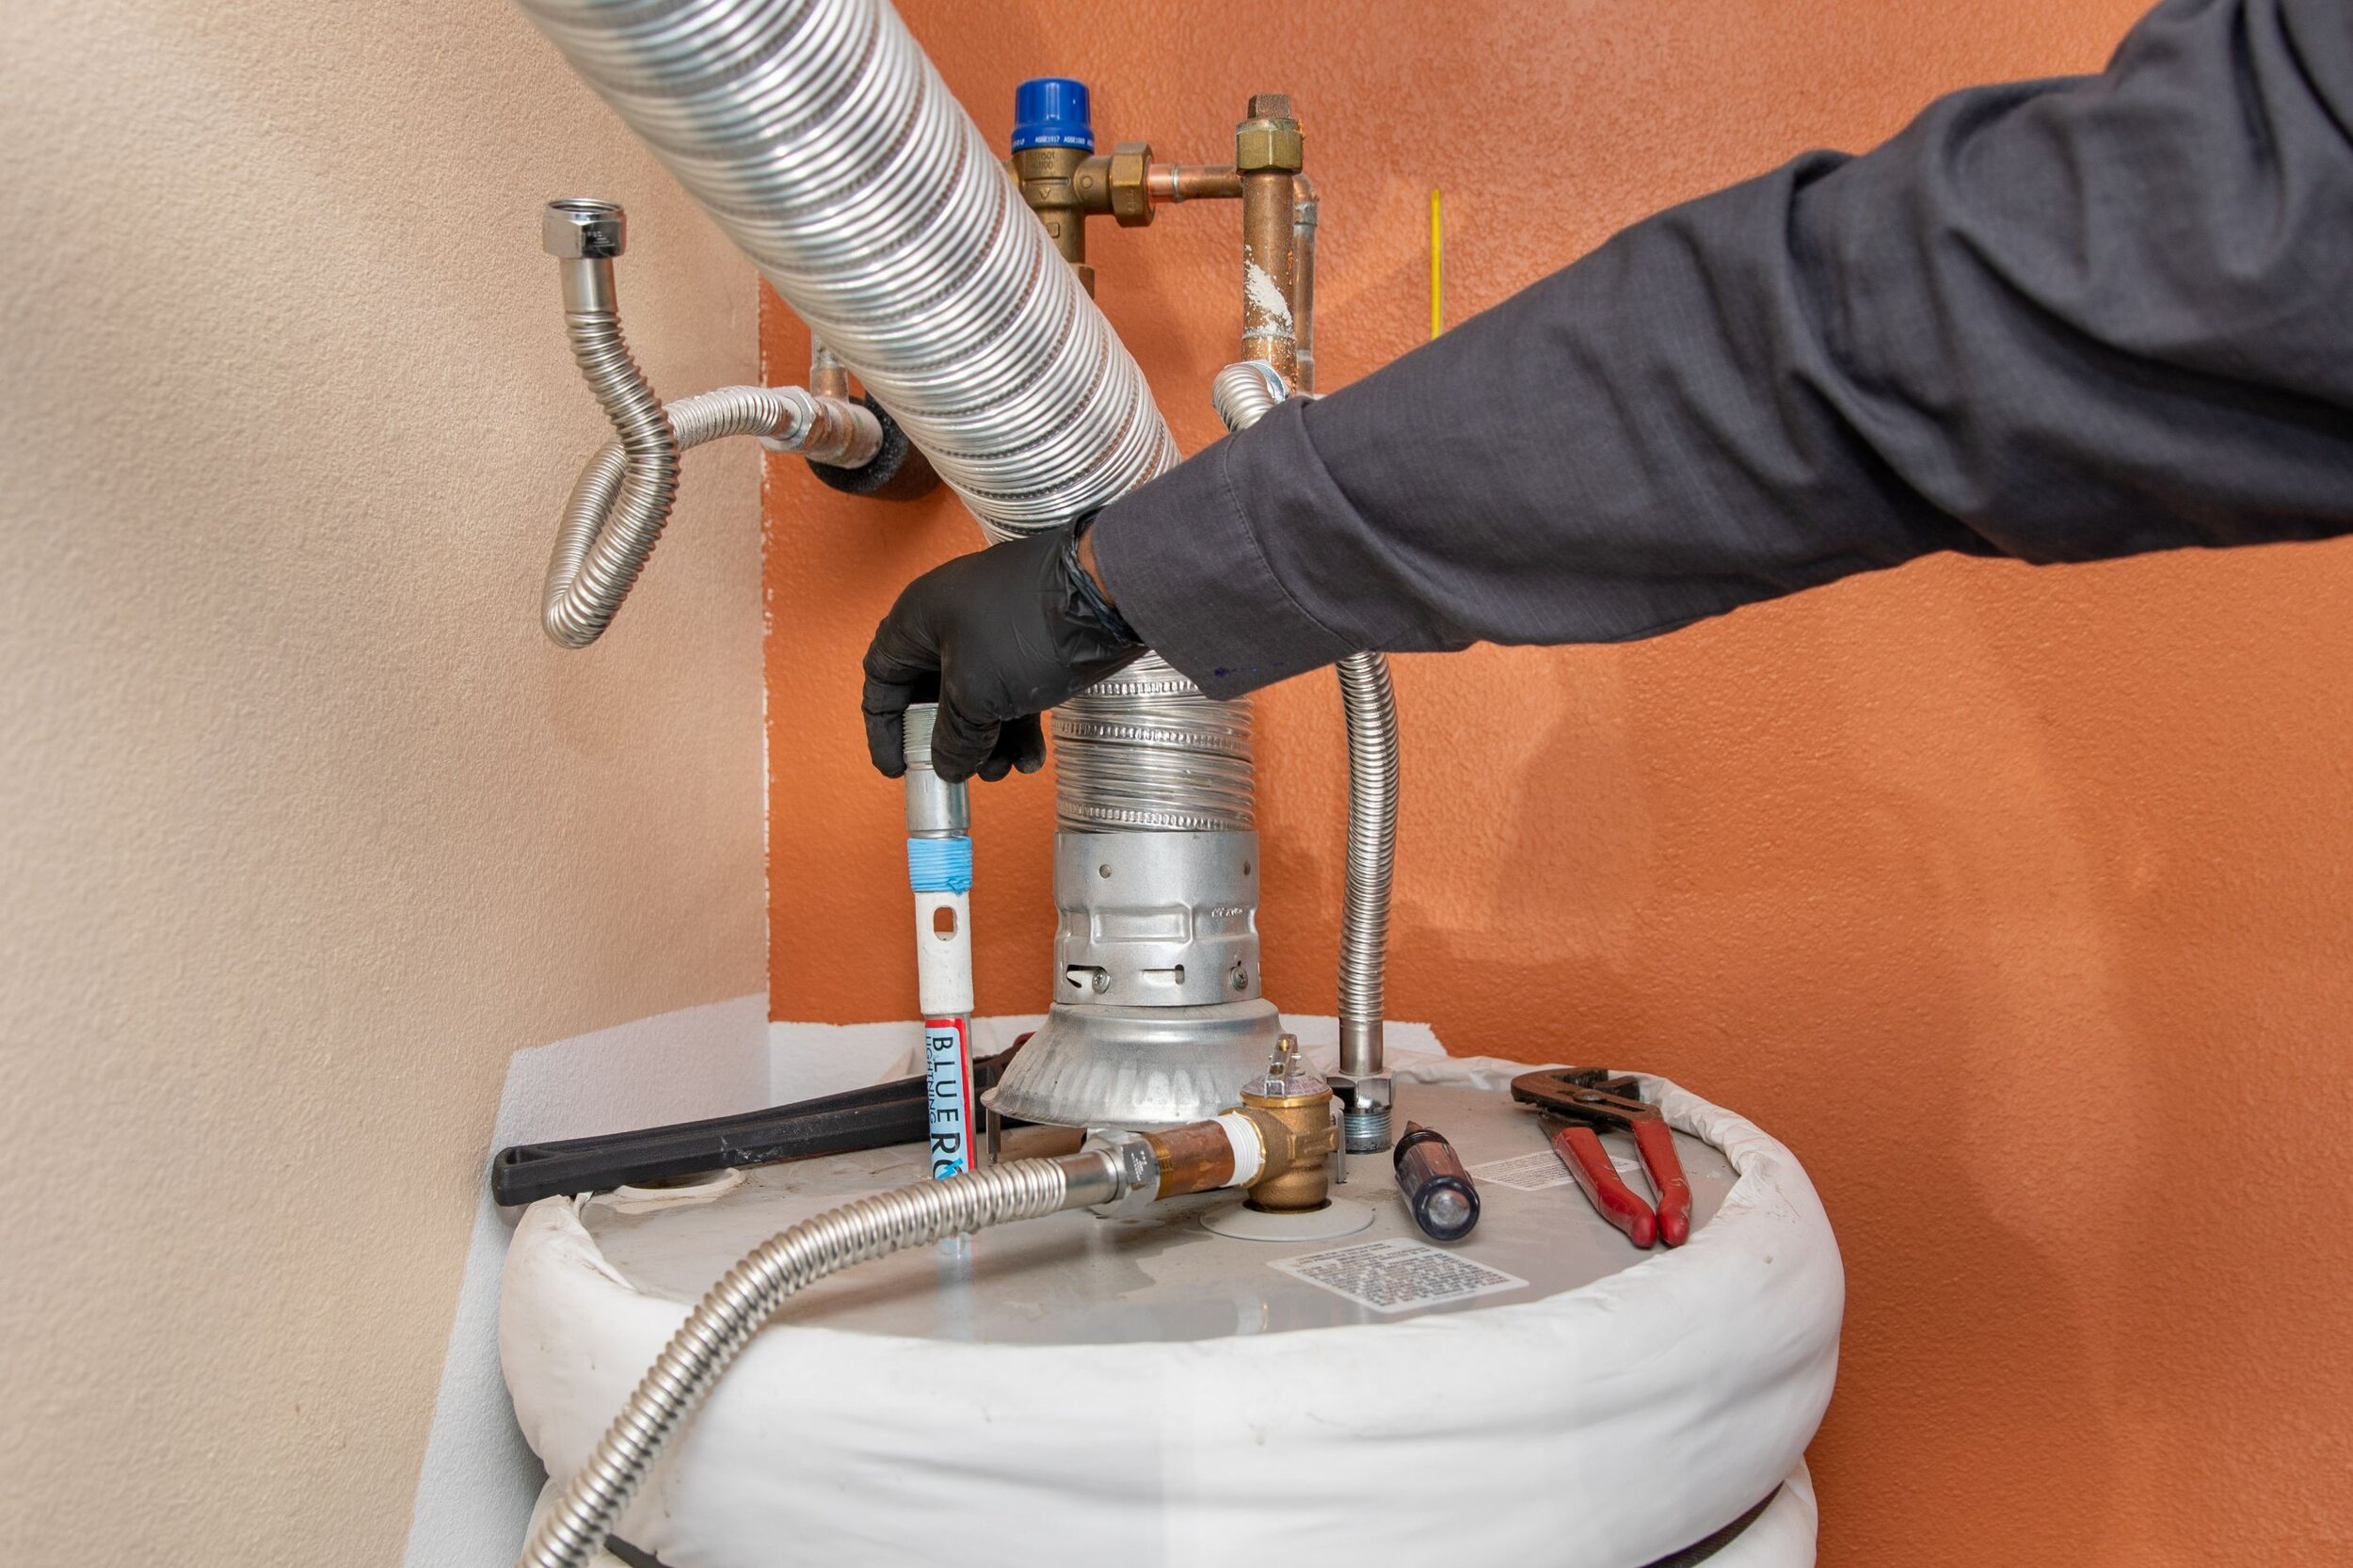 Repairing water heater anode rod in Elizabethton, TN